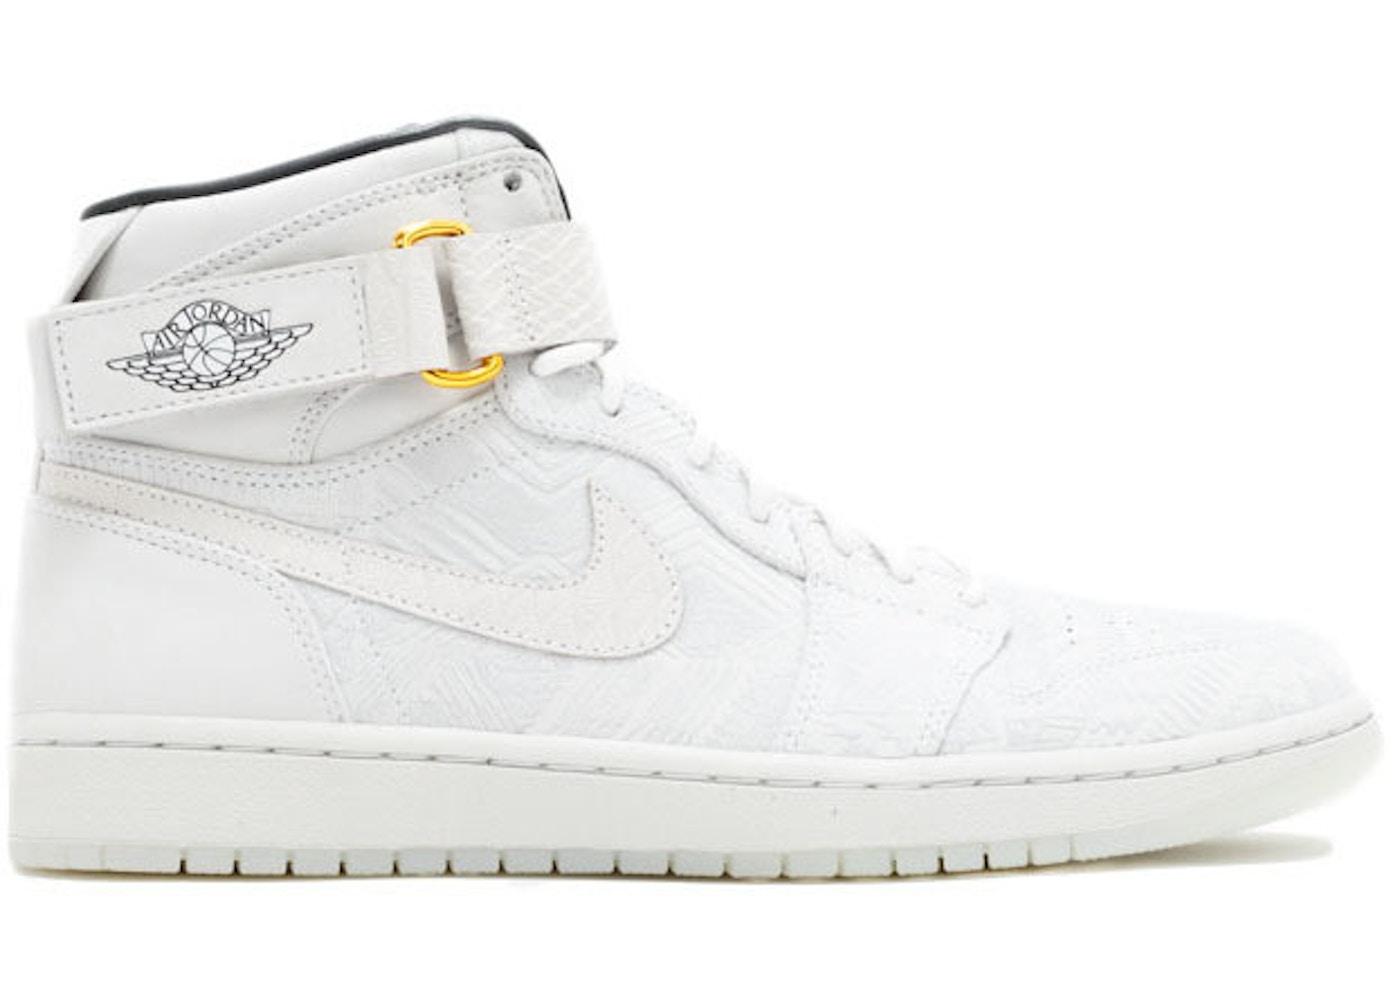 reputable site 4ea05 749f8 Air Jordan Size 7 Shoes - Average Sale Price